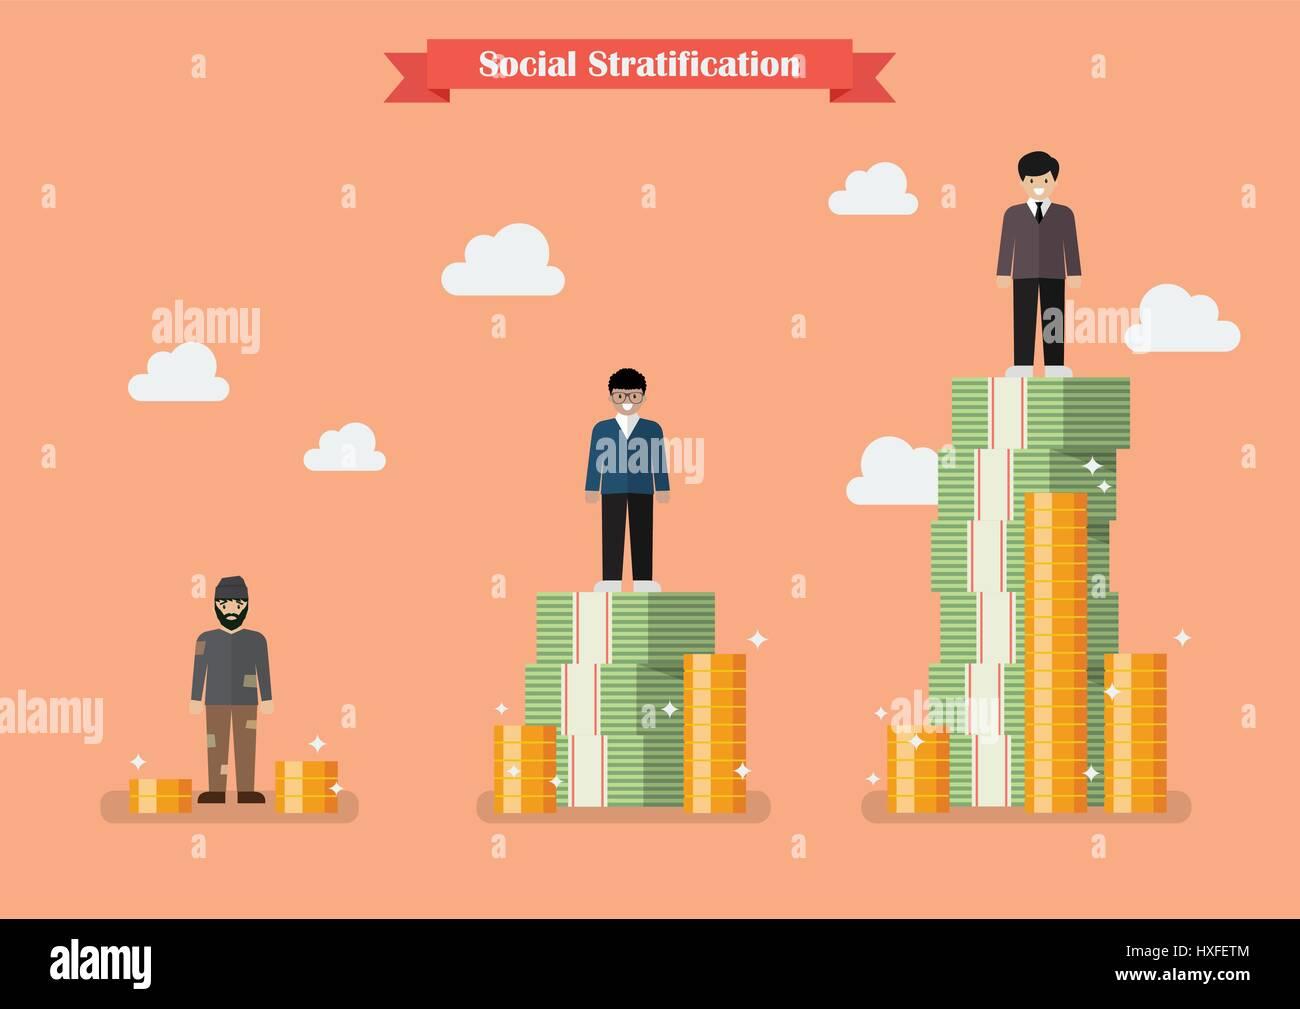 Social Stratification Stock Photos & Social Stratification